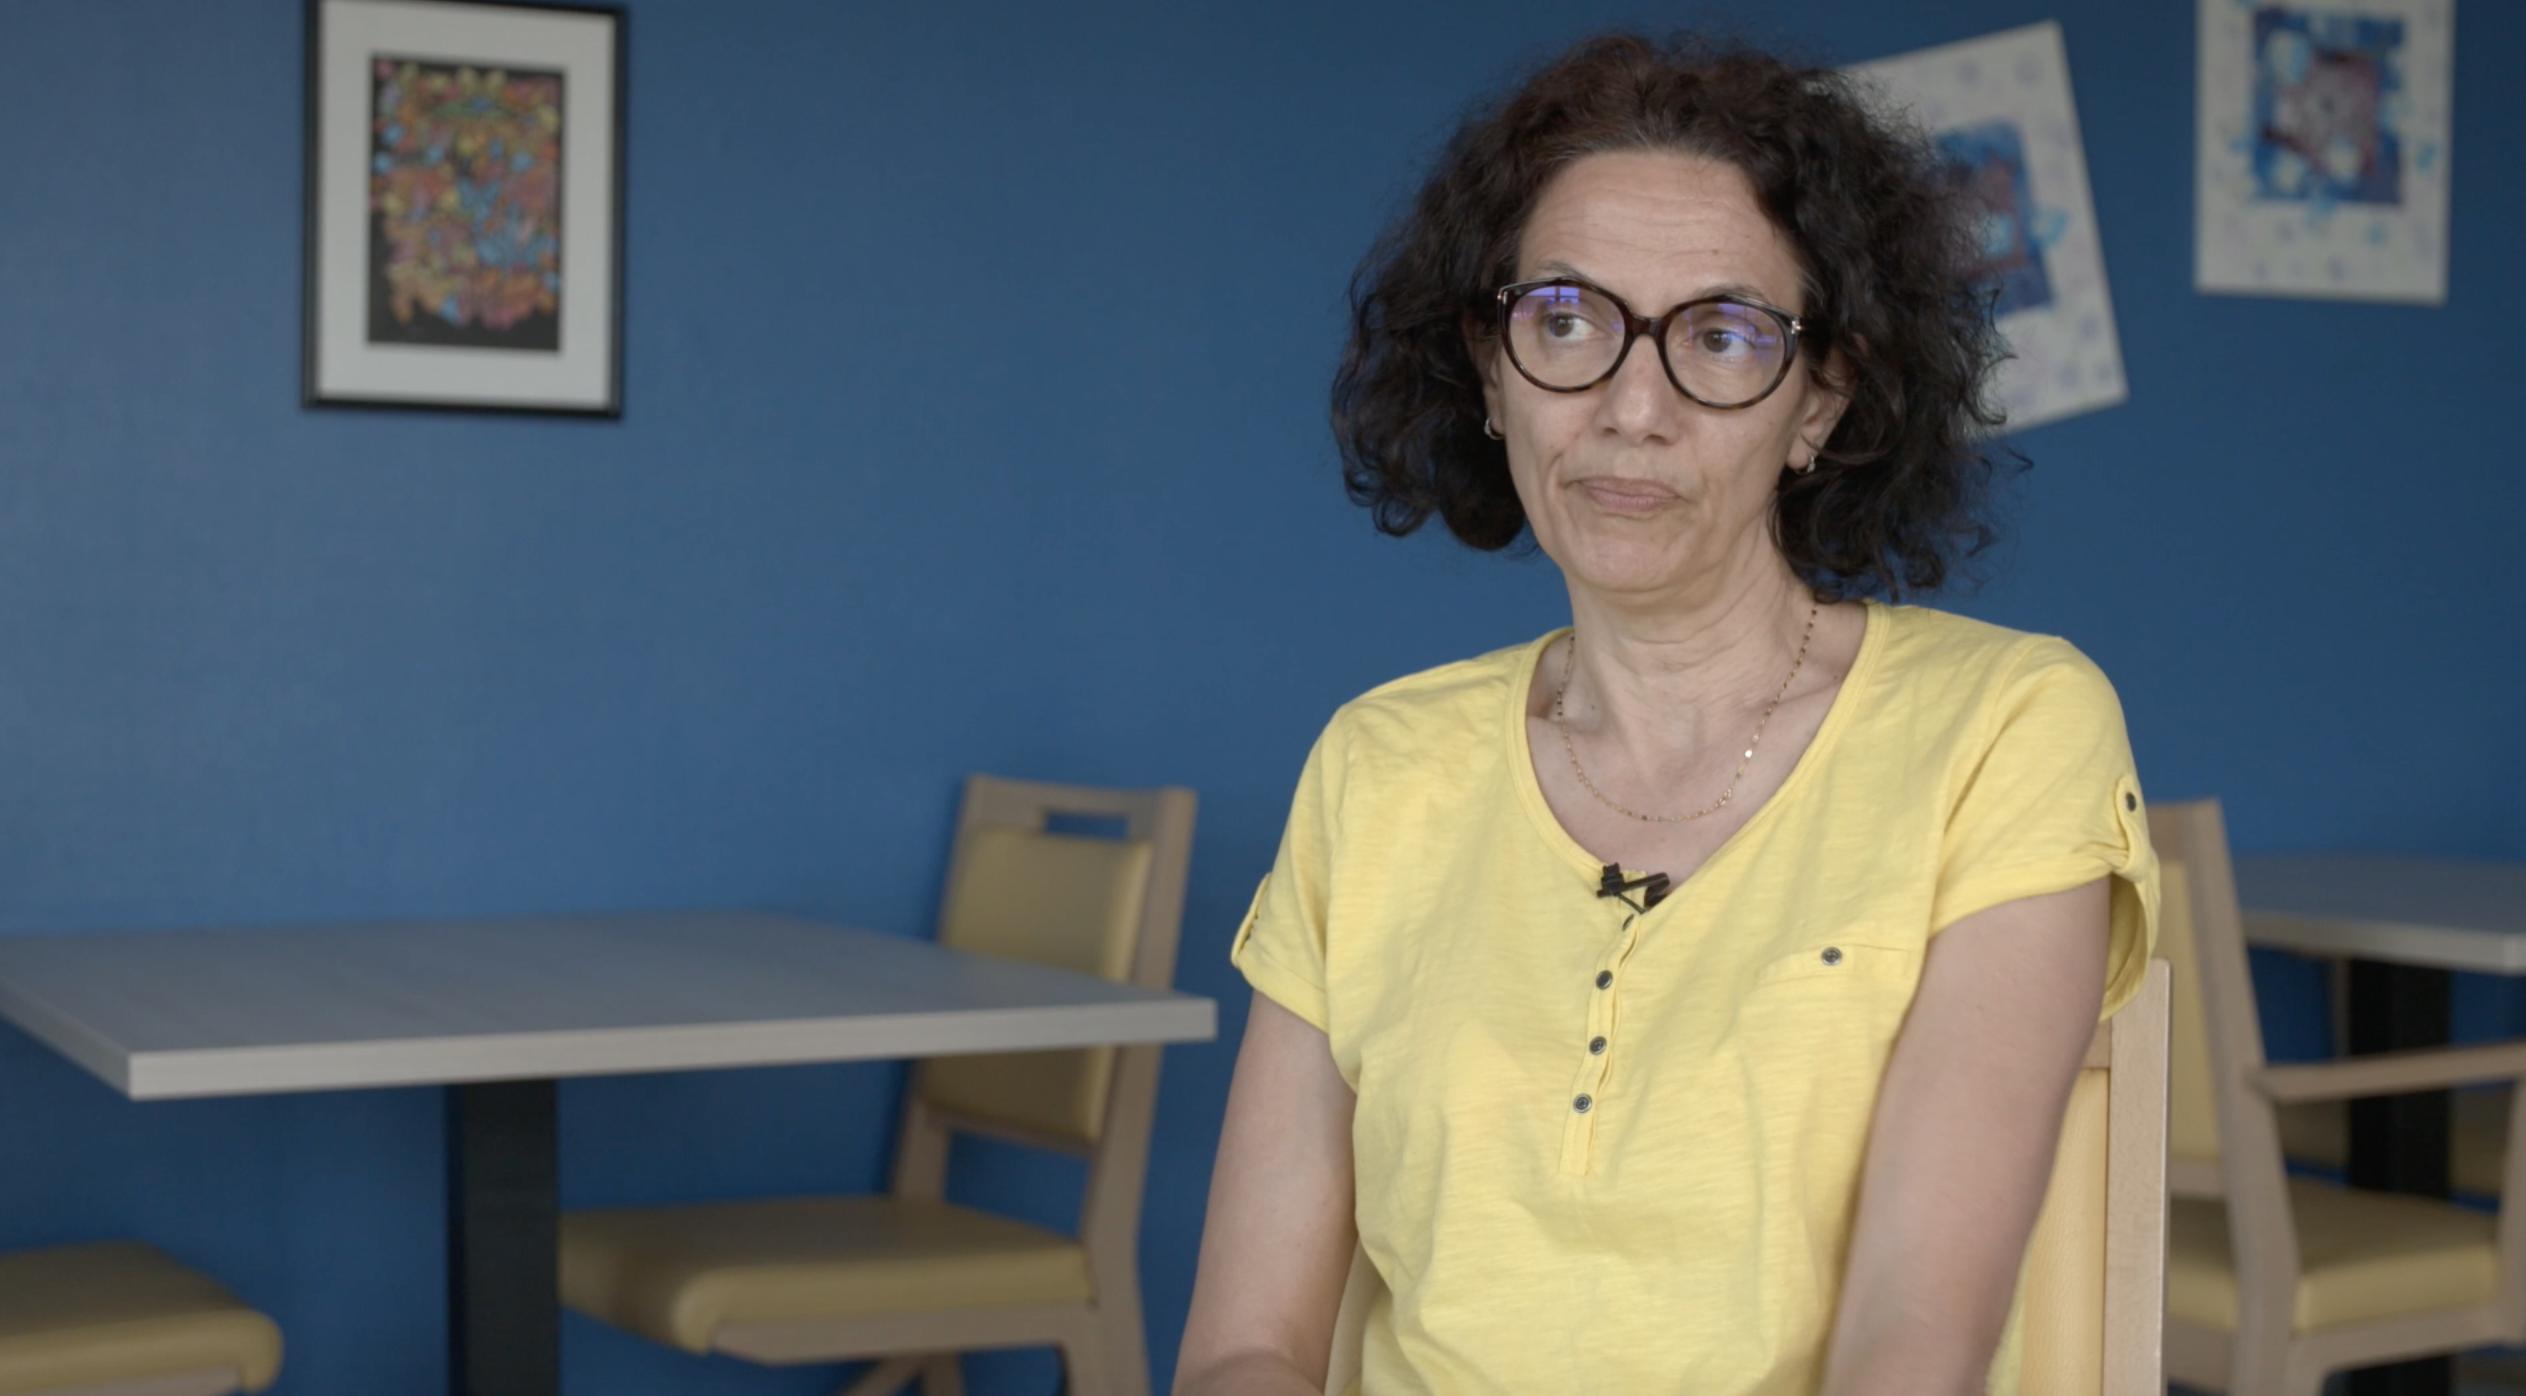 role infirmiere nutrition 3S handicap soin conseil aide medecin